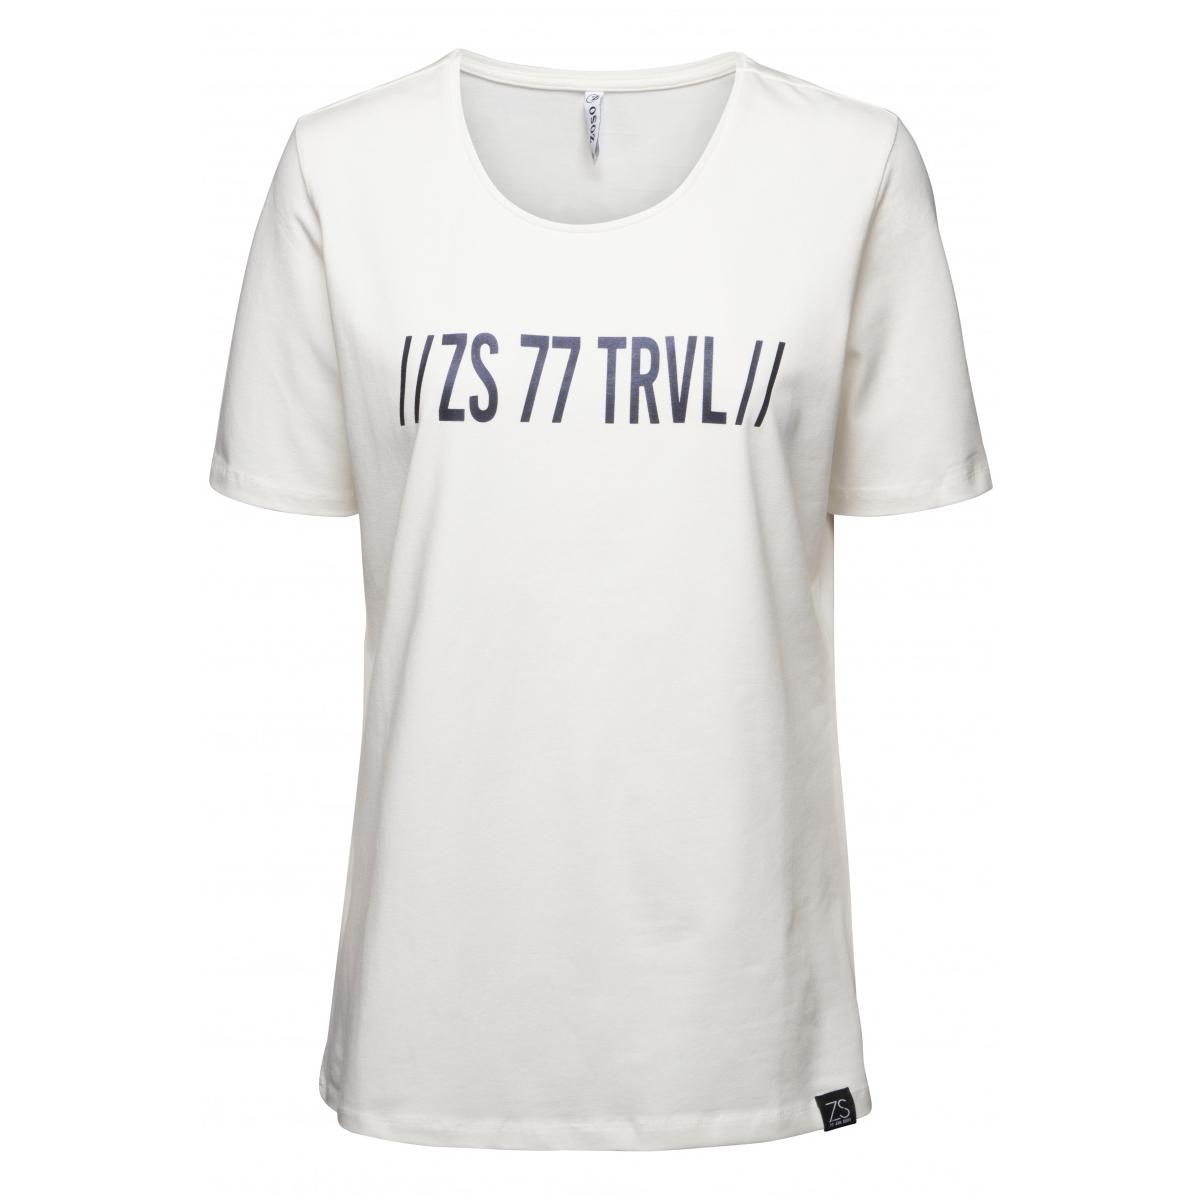 dorsey t-shirt with print 194 zoso t-shirt offwhite/black